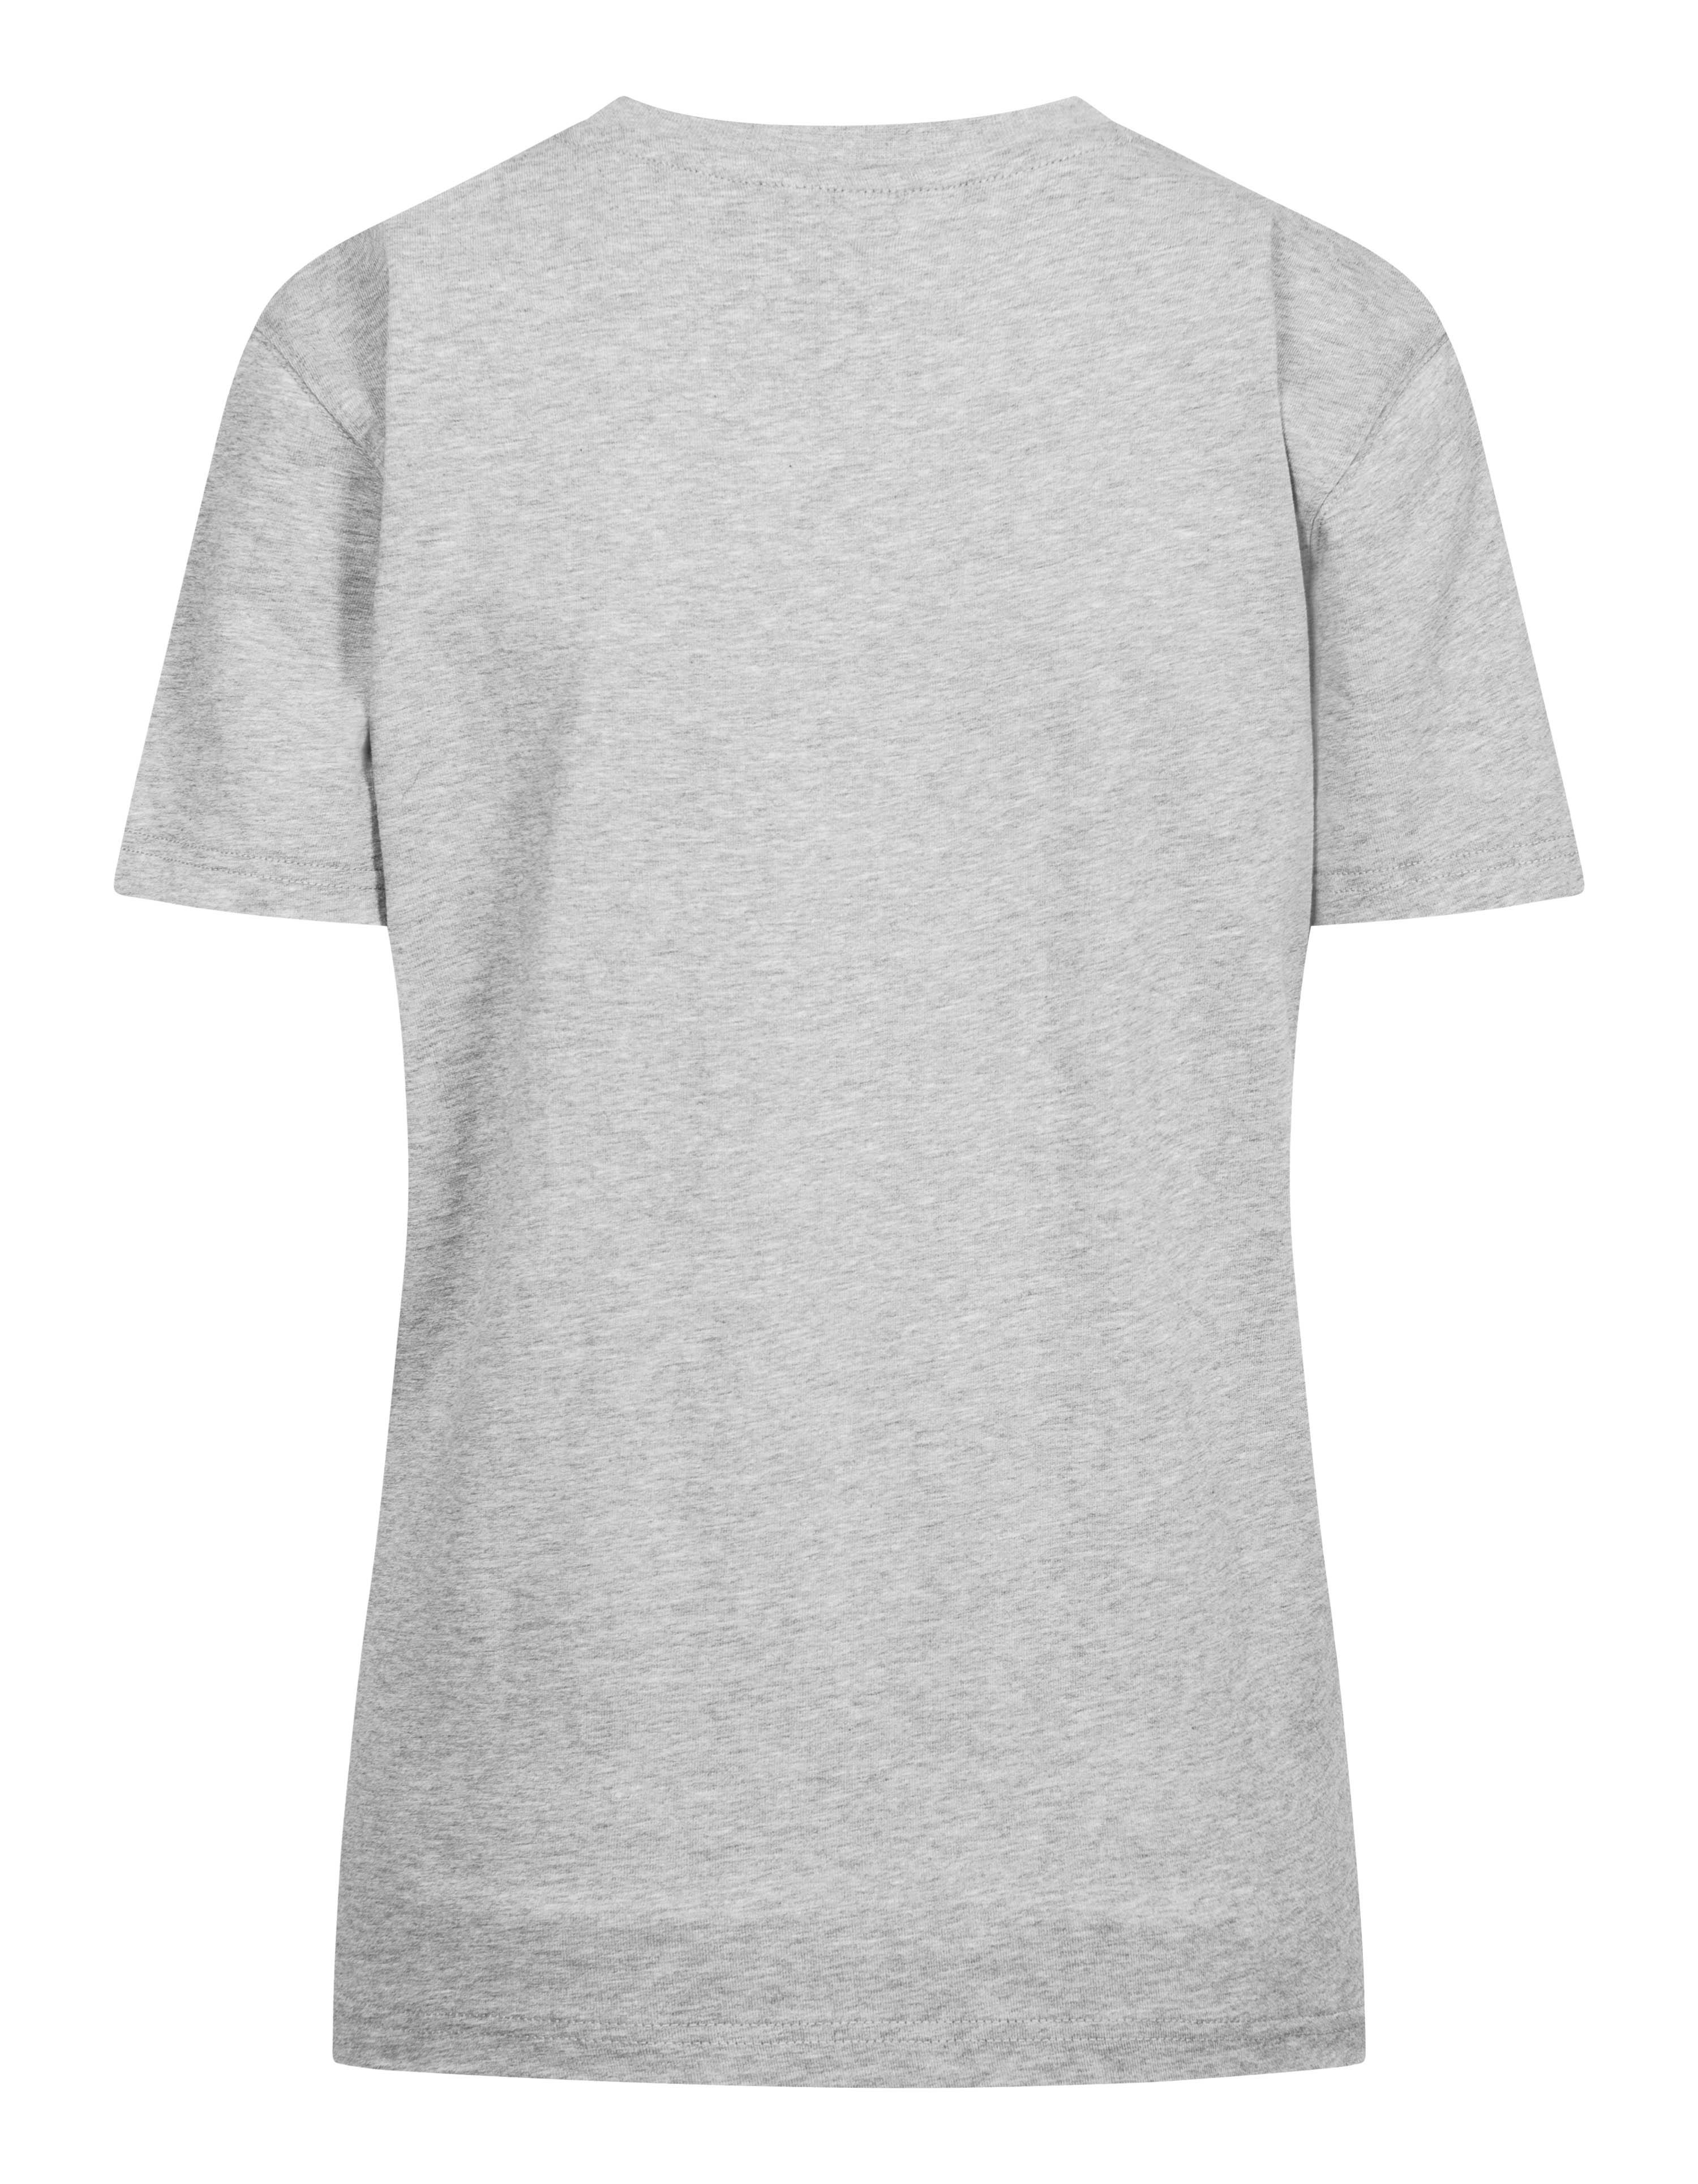 Han Kjøbenhavn Casual Tee, light grey melange logo, large